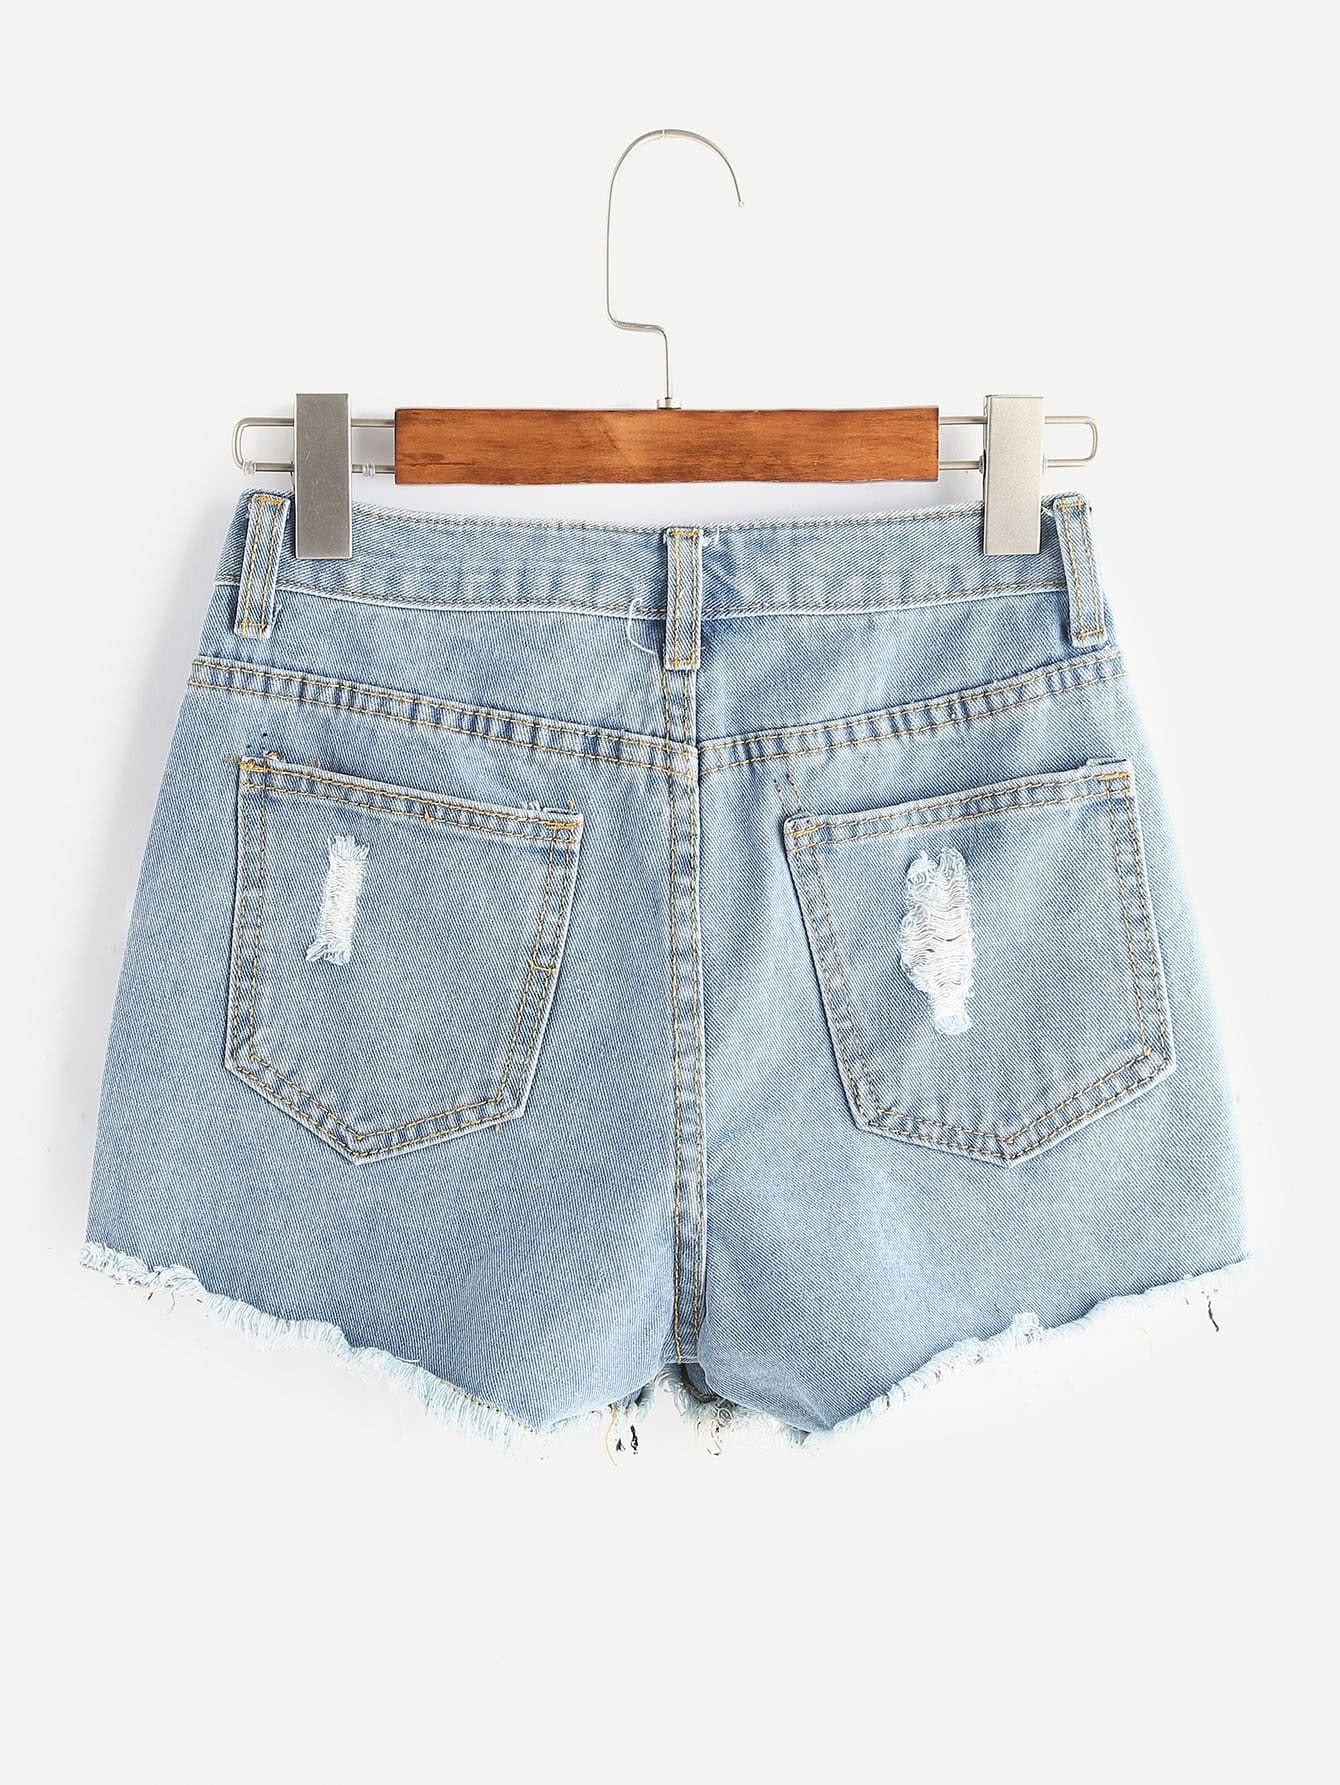 shorts170322002_2